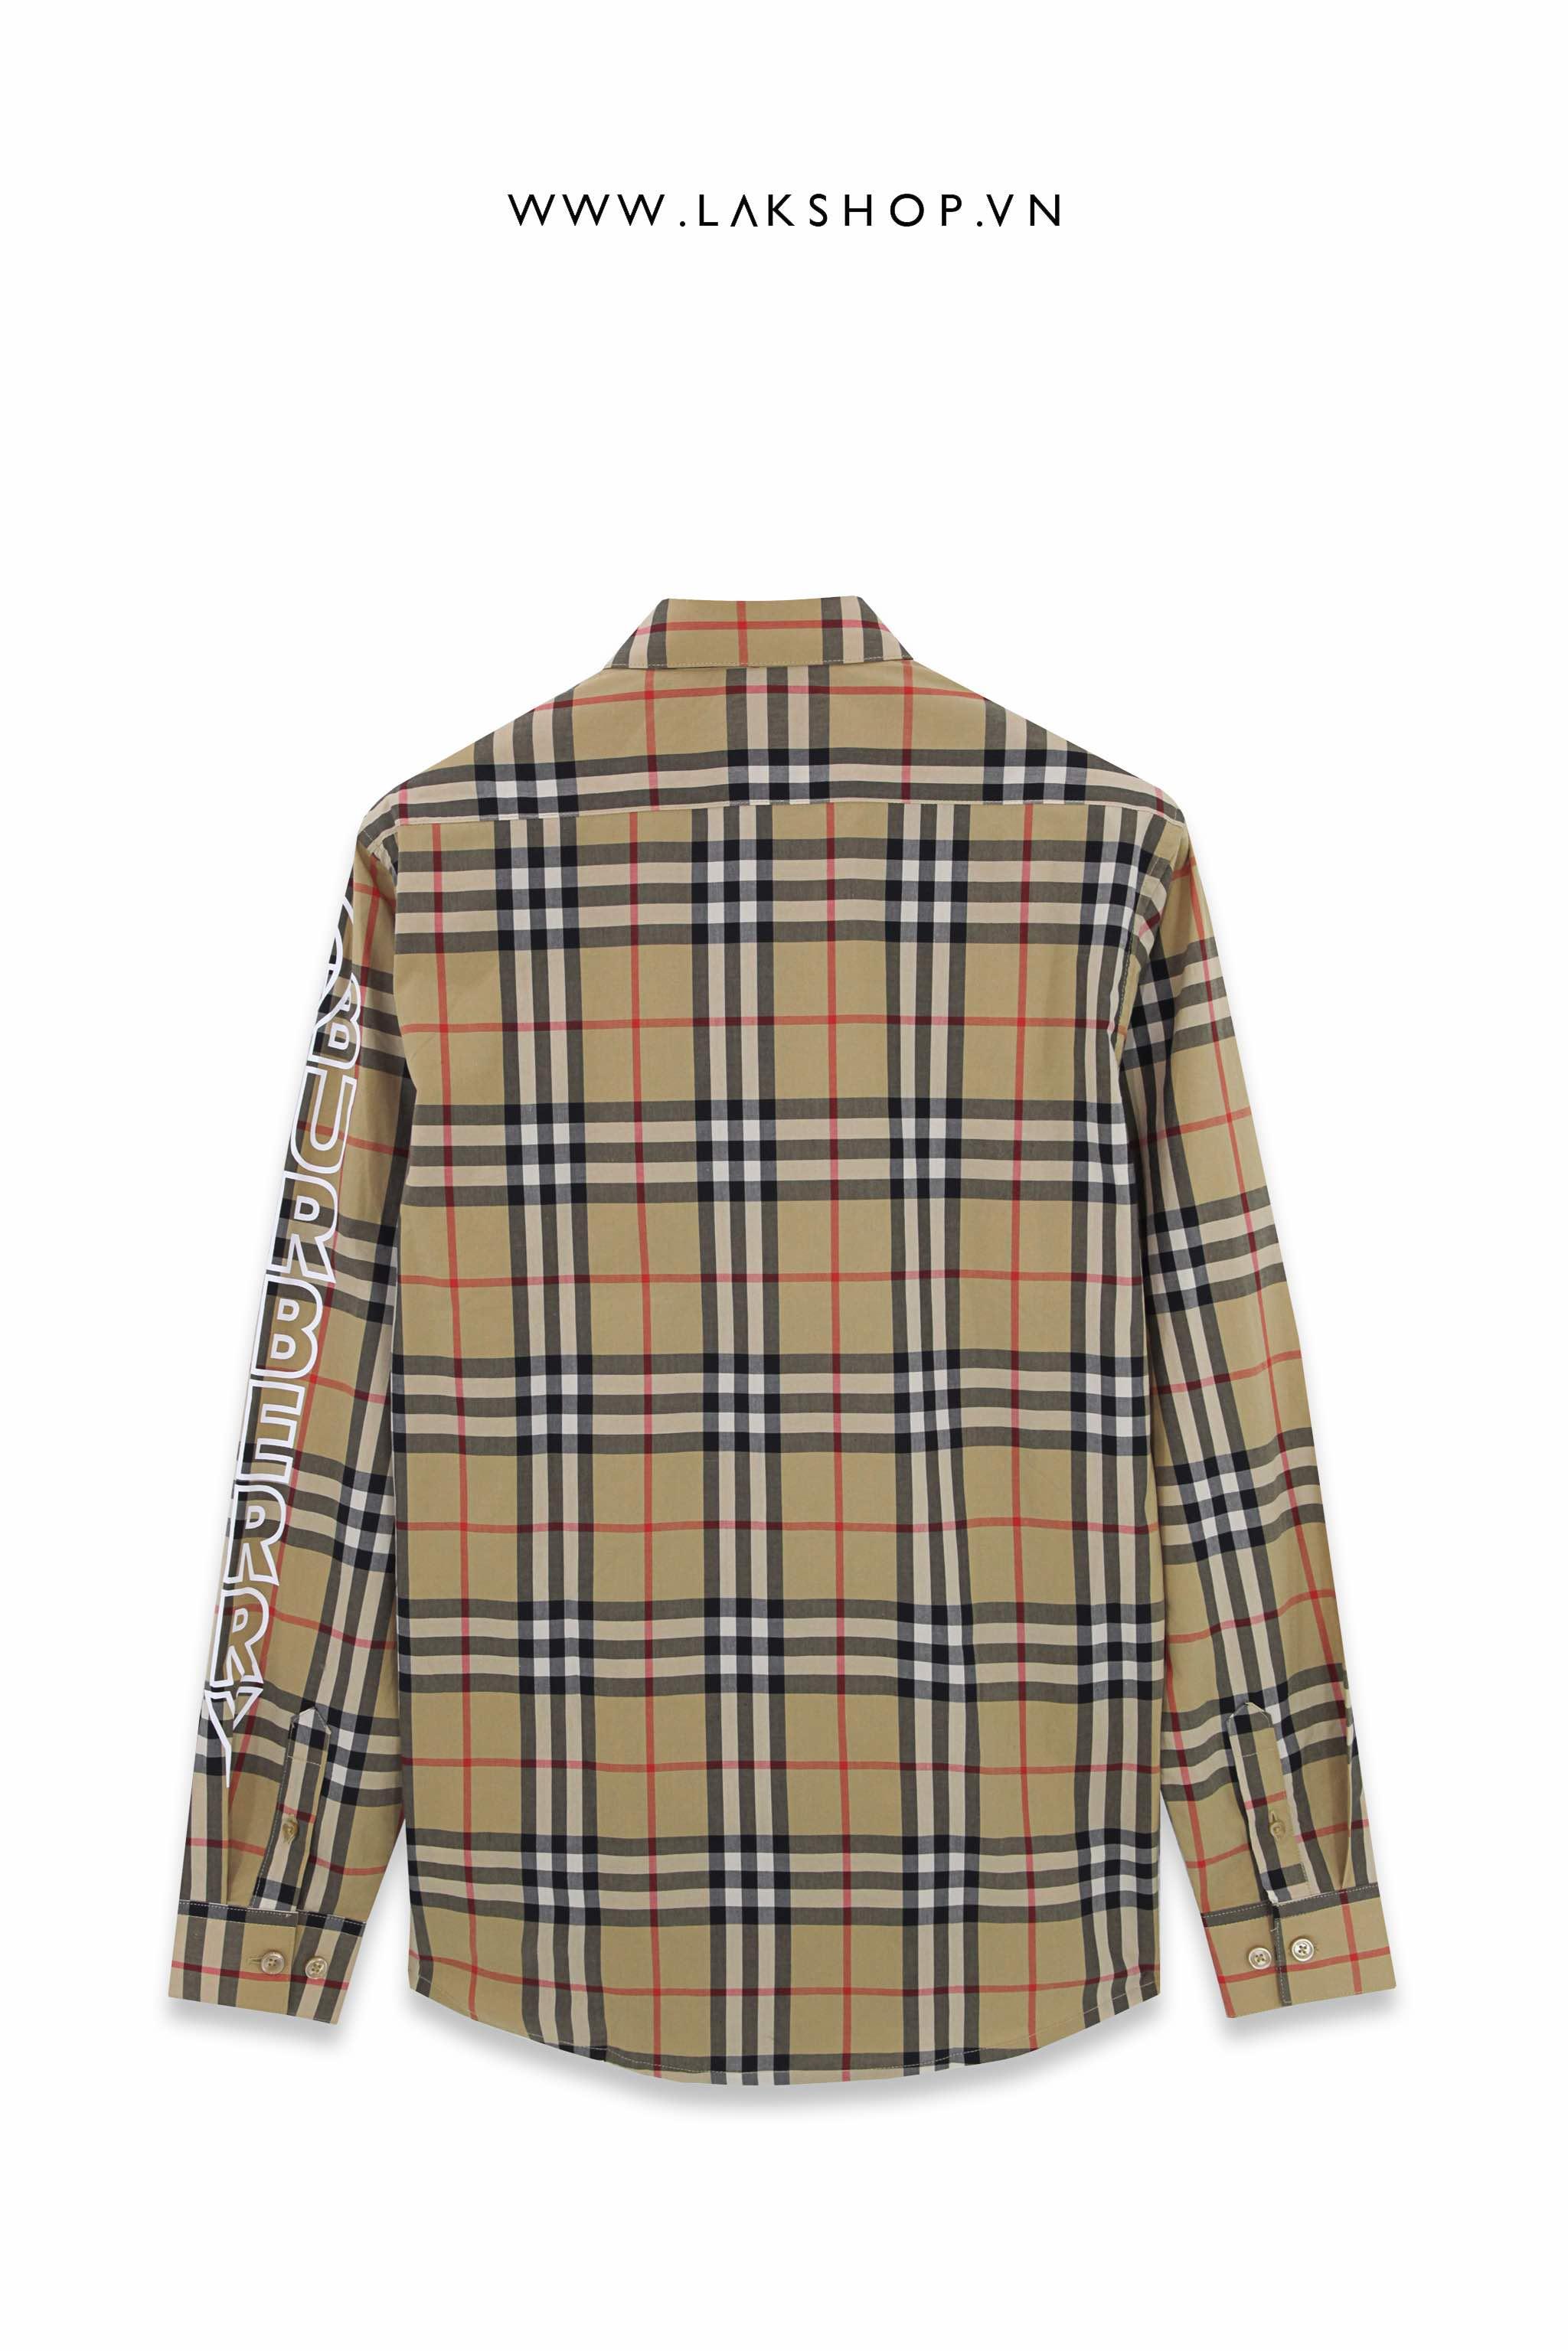 Gucci GG Monogram Mesh Double Shirt cv1